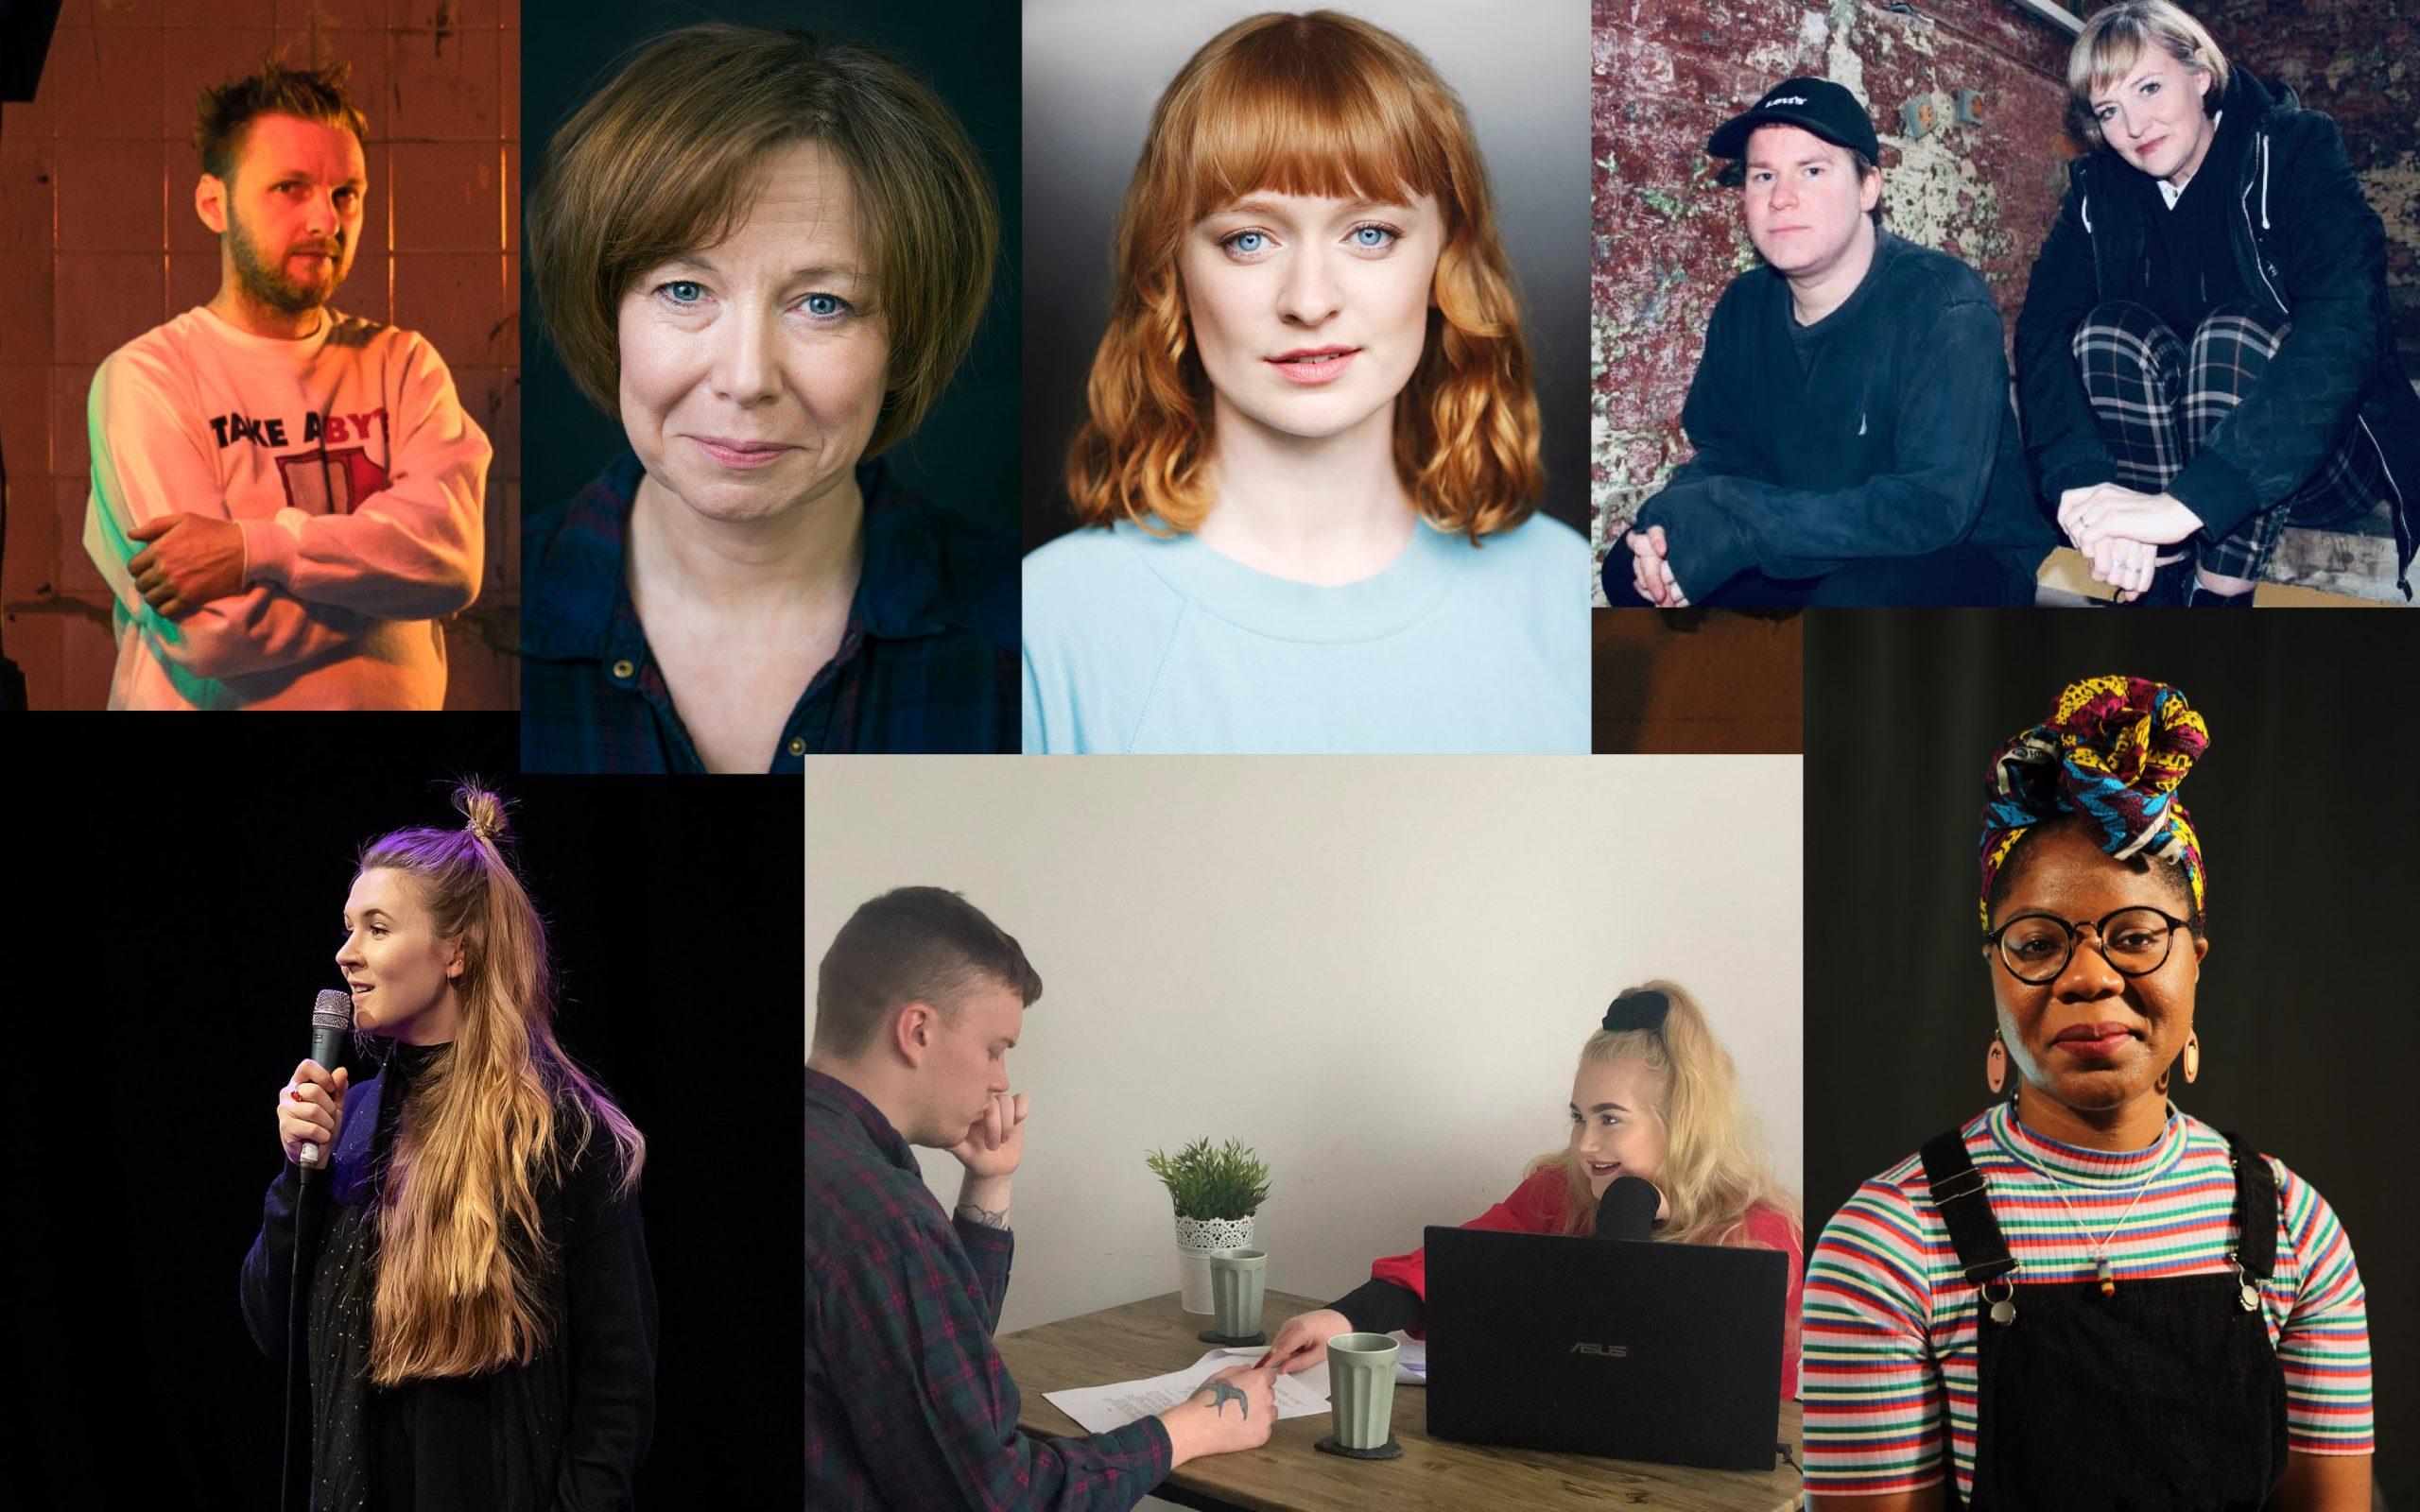 Grant Archer, Joyce Branagh, Tori Burgess, Dare To Know Theatre, Caitlin Gleeson, Rowan Prescott and Chloe Heywood, Jade Williams